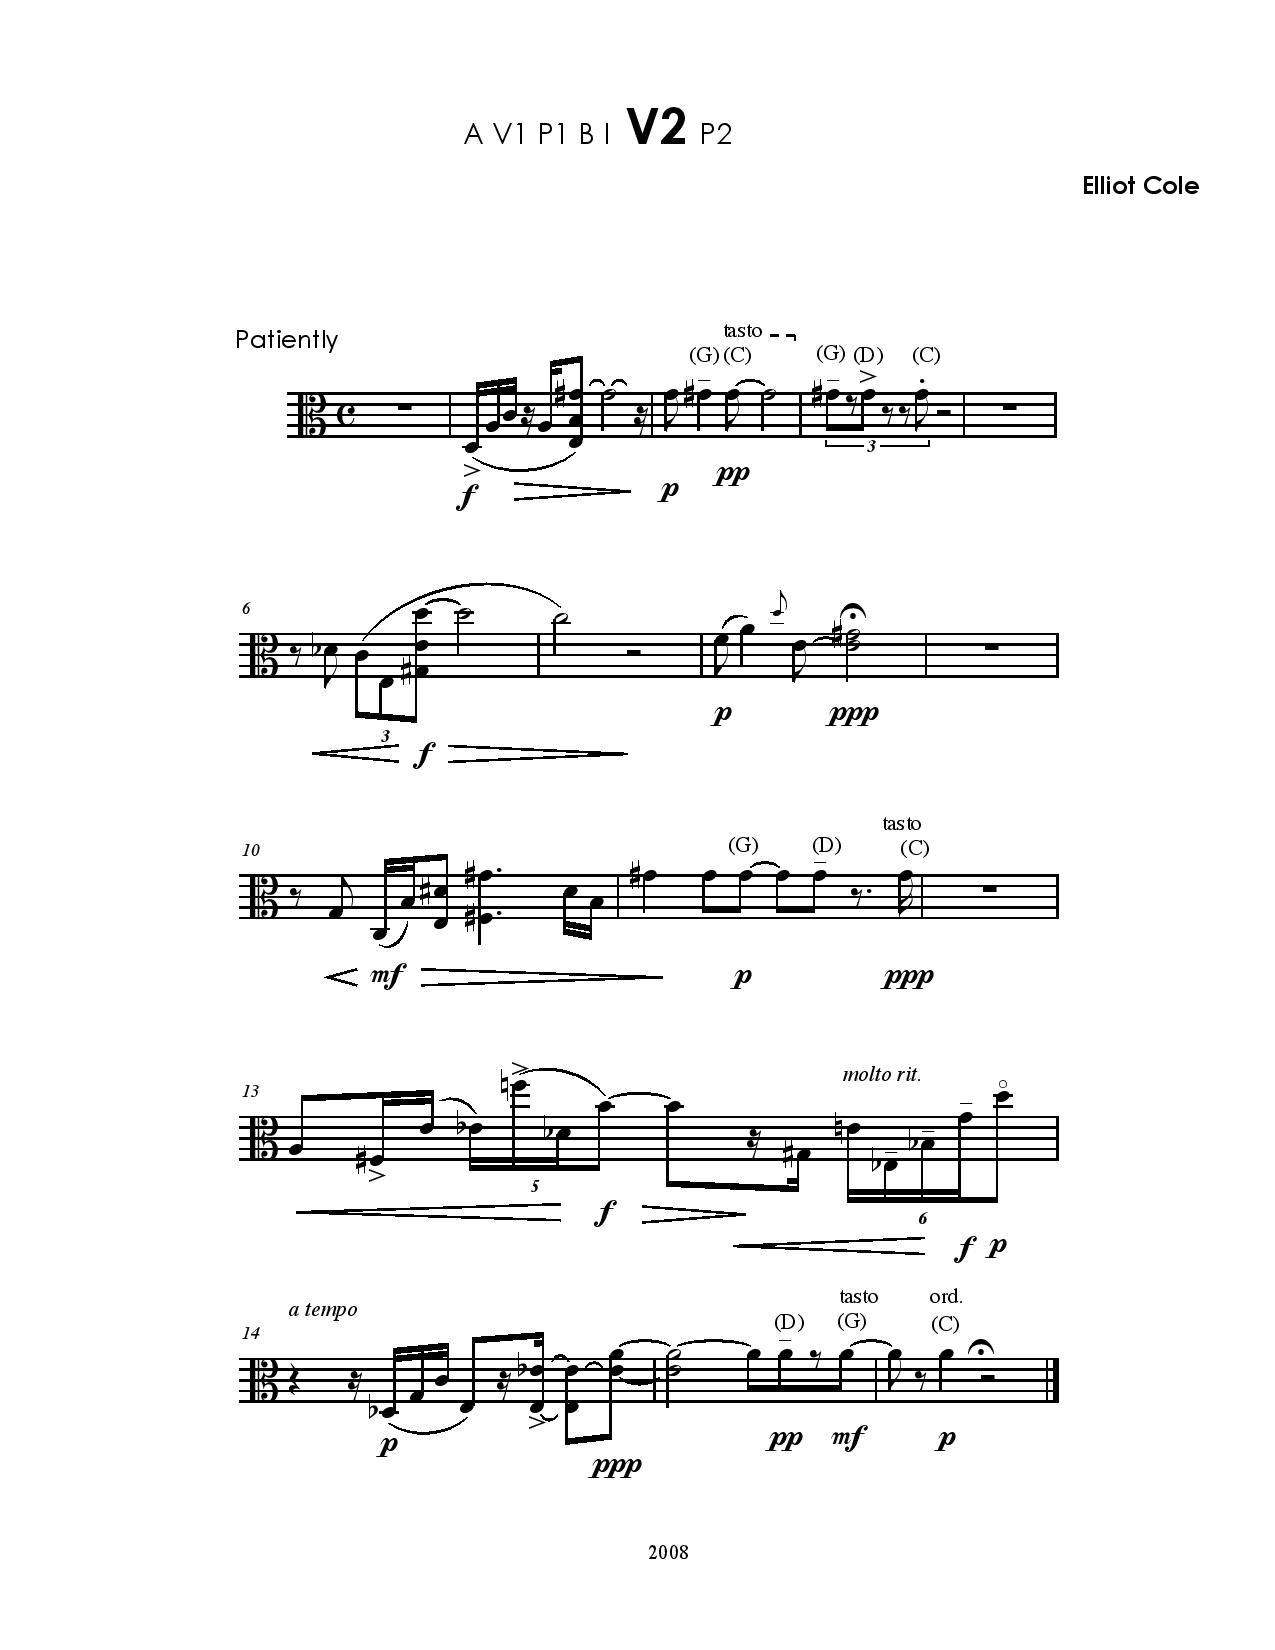 elliotcole-O-page-014.jpg